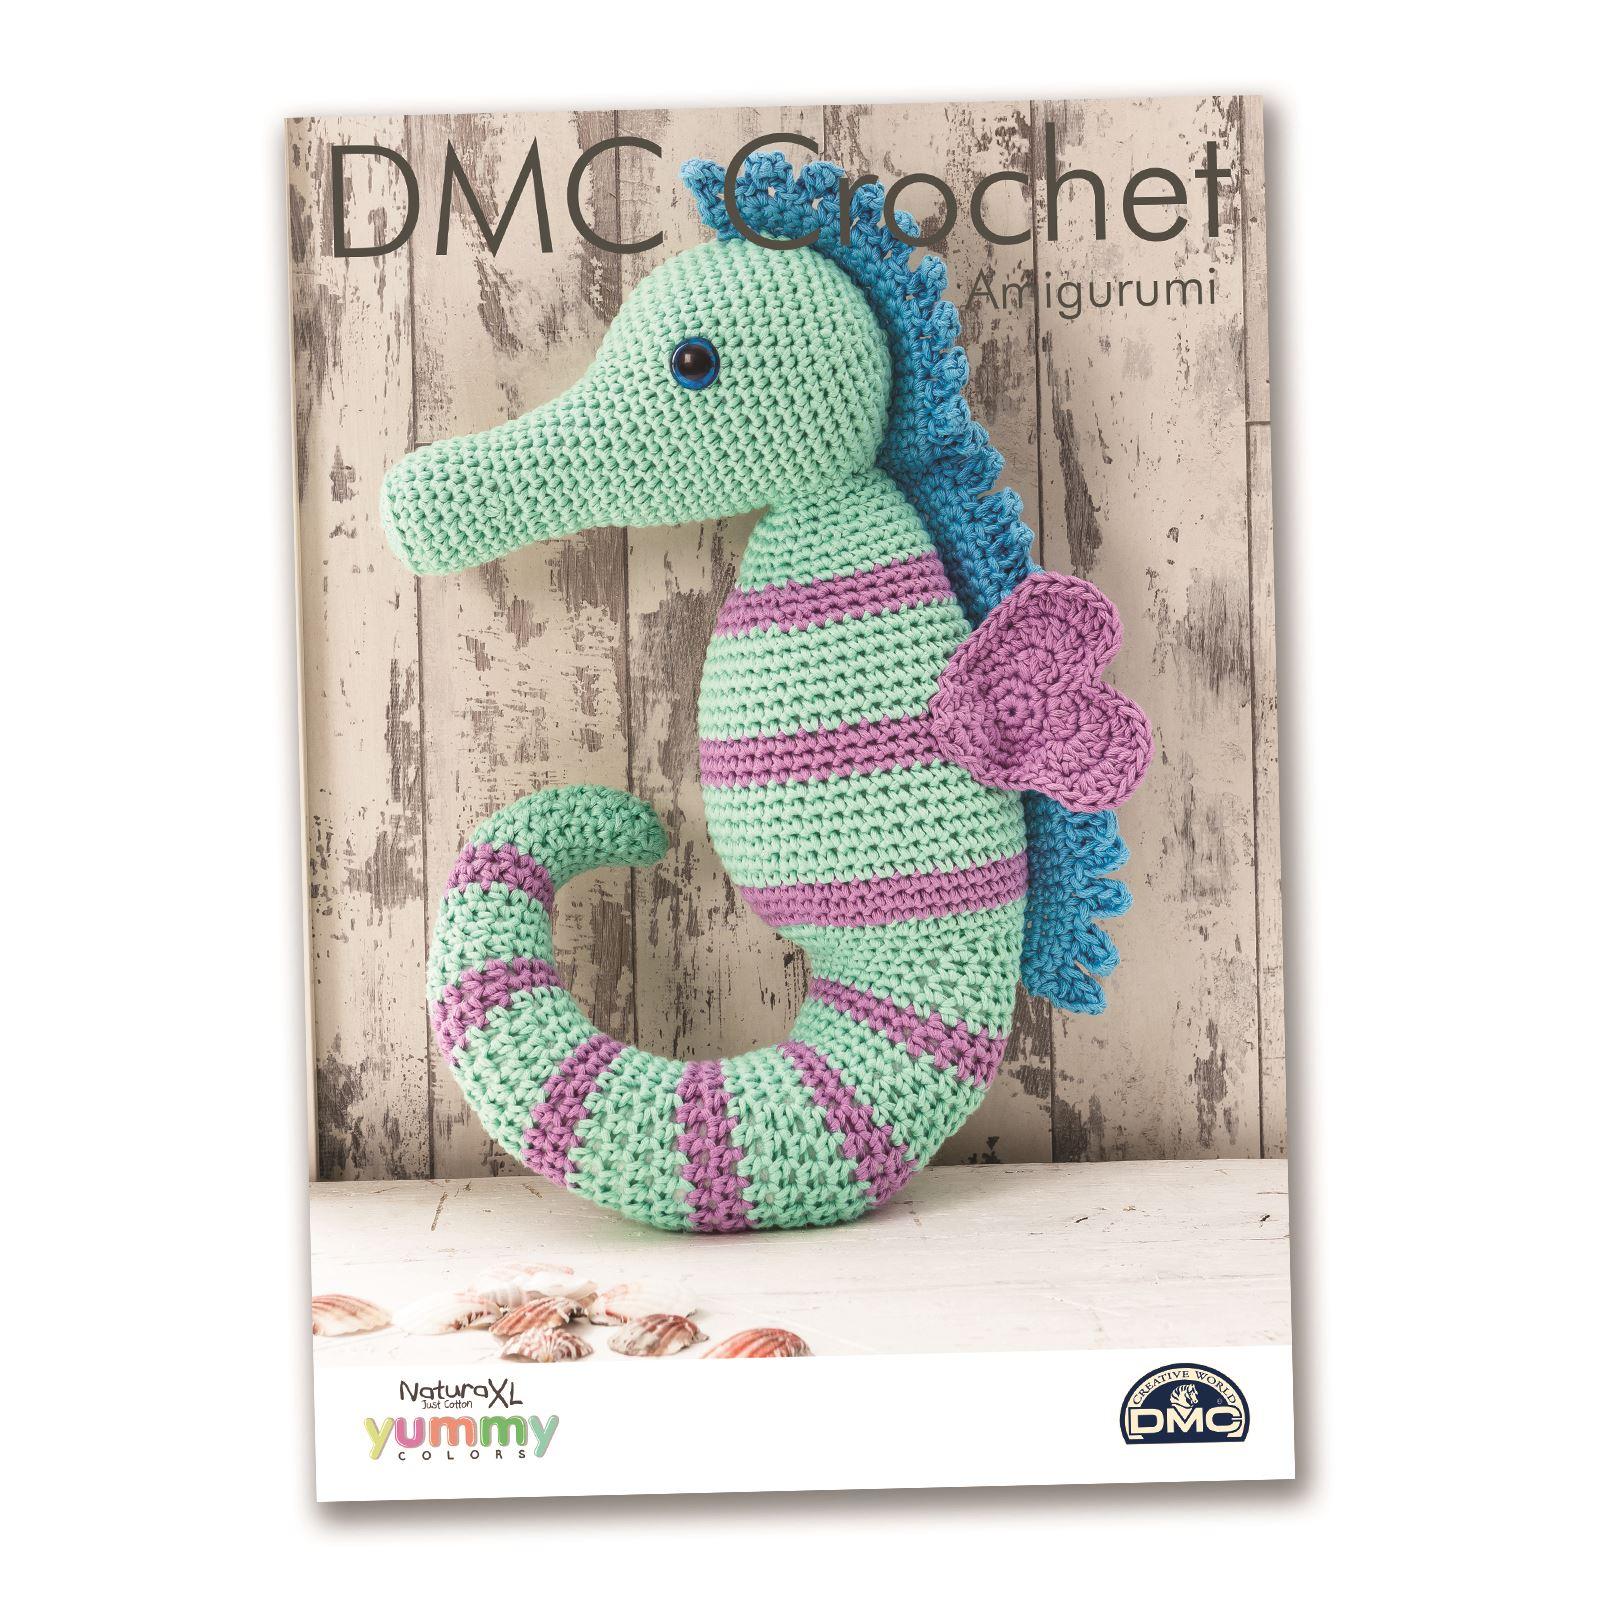 Xl Crochet Patterns : DMC Natura XL Yummy Crochet Patterns Amigurumi Home Decor eBay